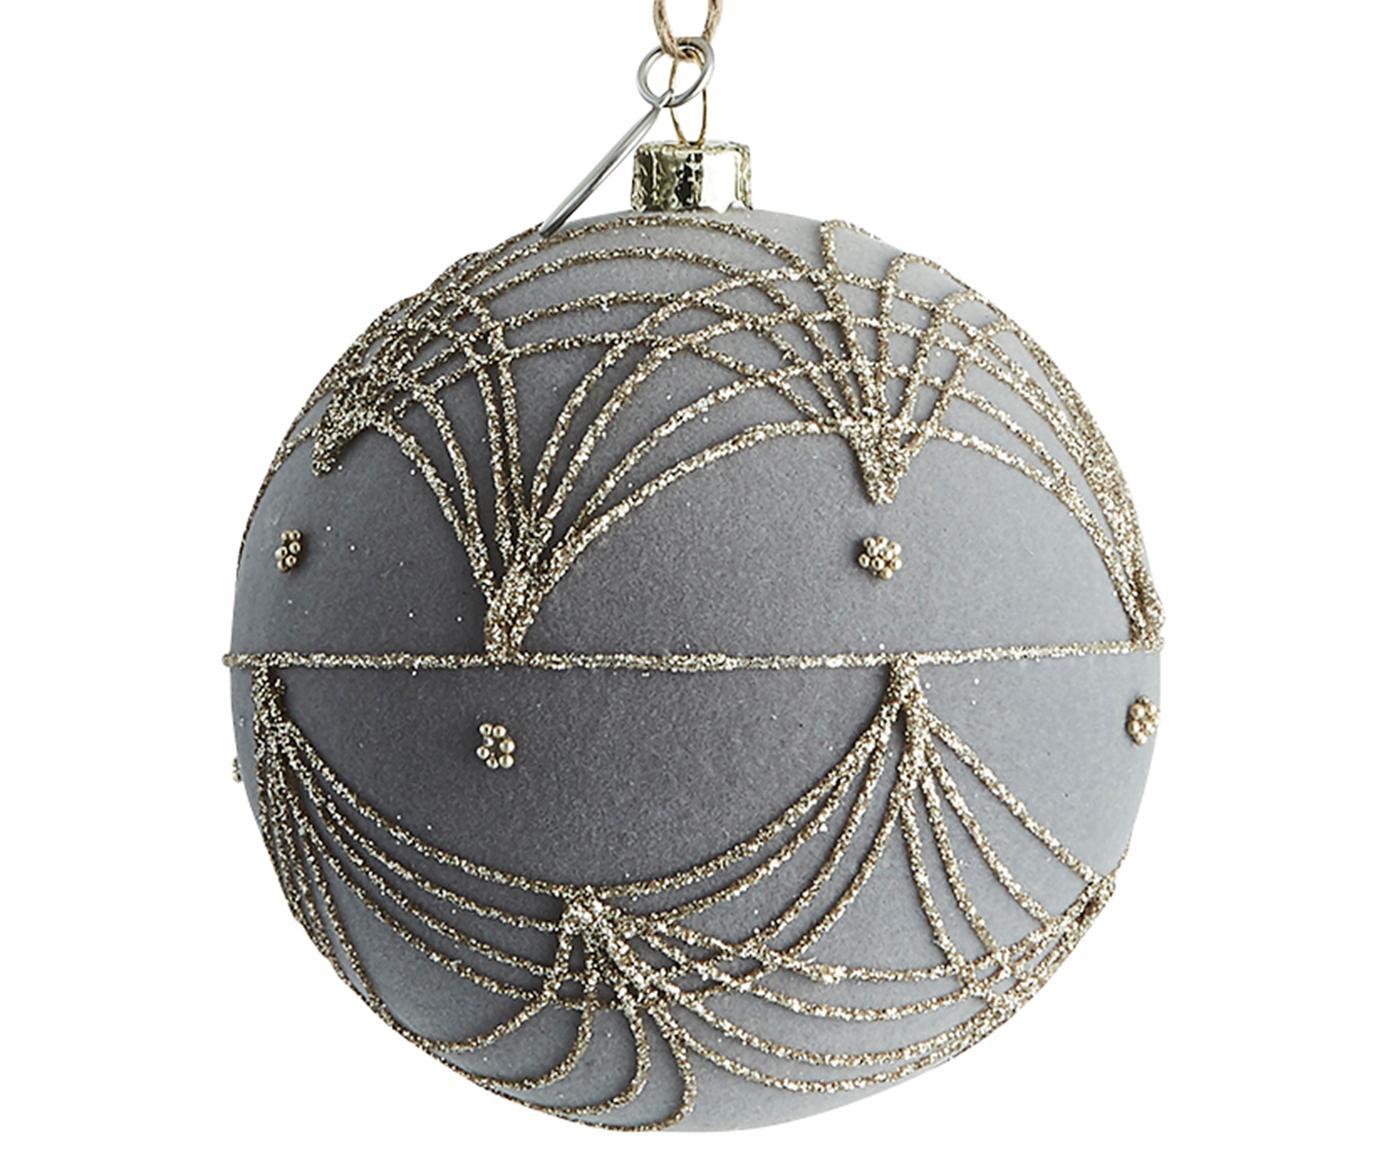 Bolas de Navidad Jalia, Plástico, terciopelo de poliéster, Gris, dorado, Ø 8 cm